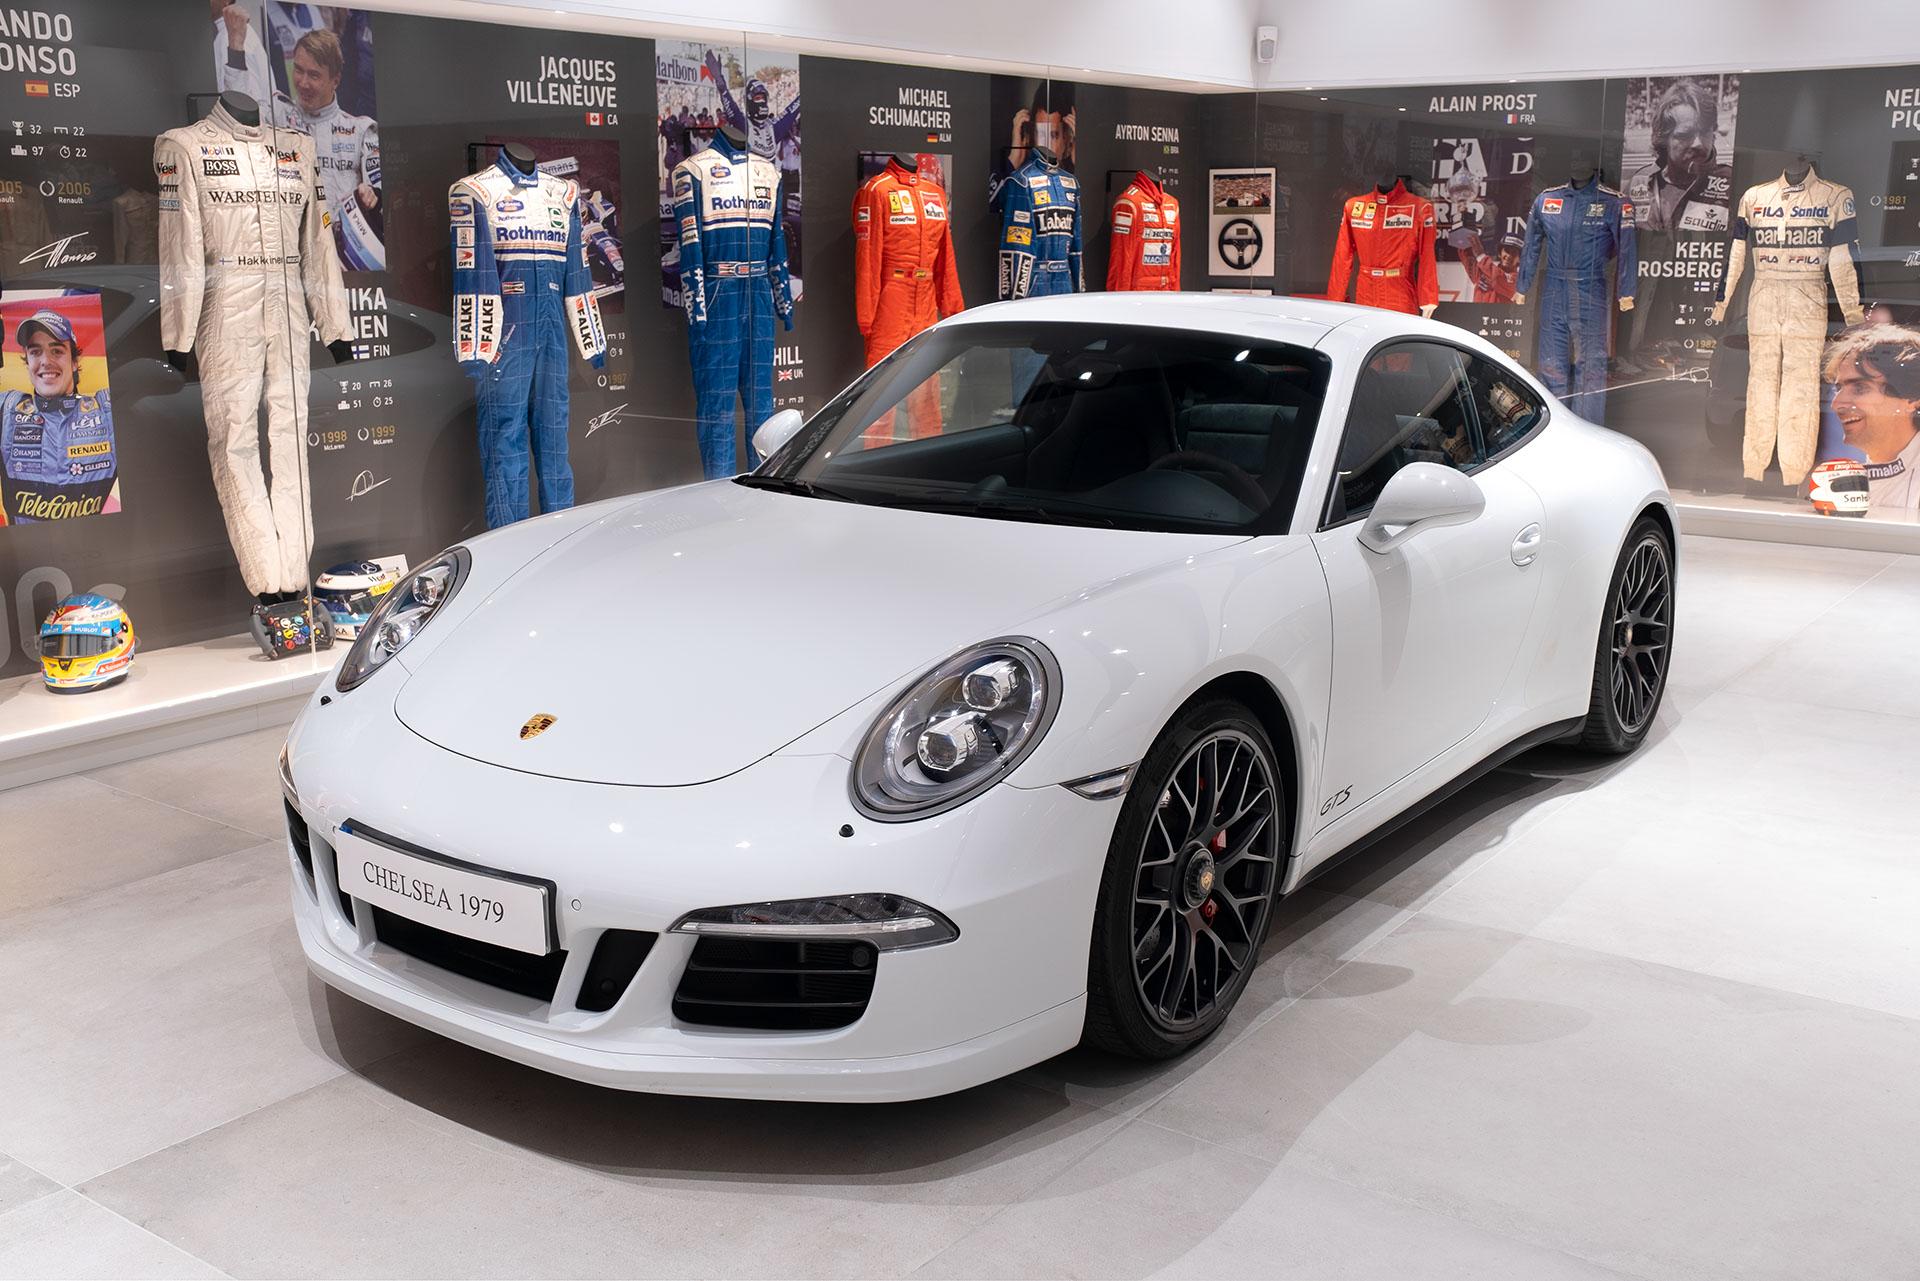 DSCF0150 Porsche 911 CARRERA 4GTS